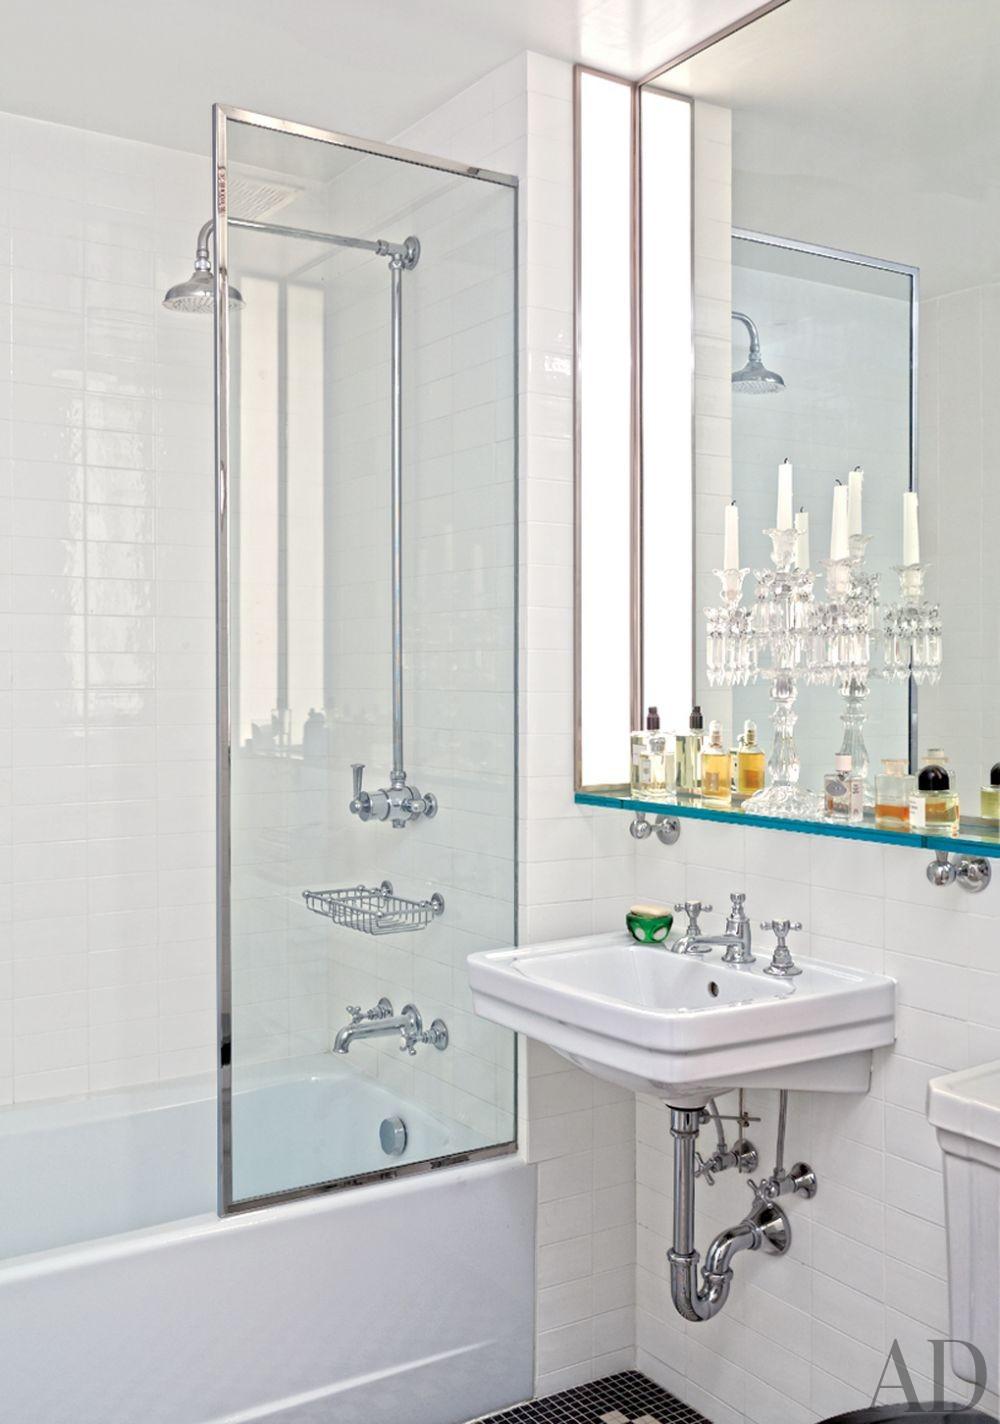 Modern Bathroom by Robert Passal Interior & Architectural Design in New York, New York